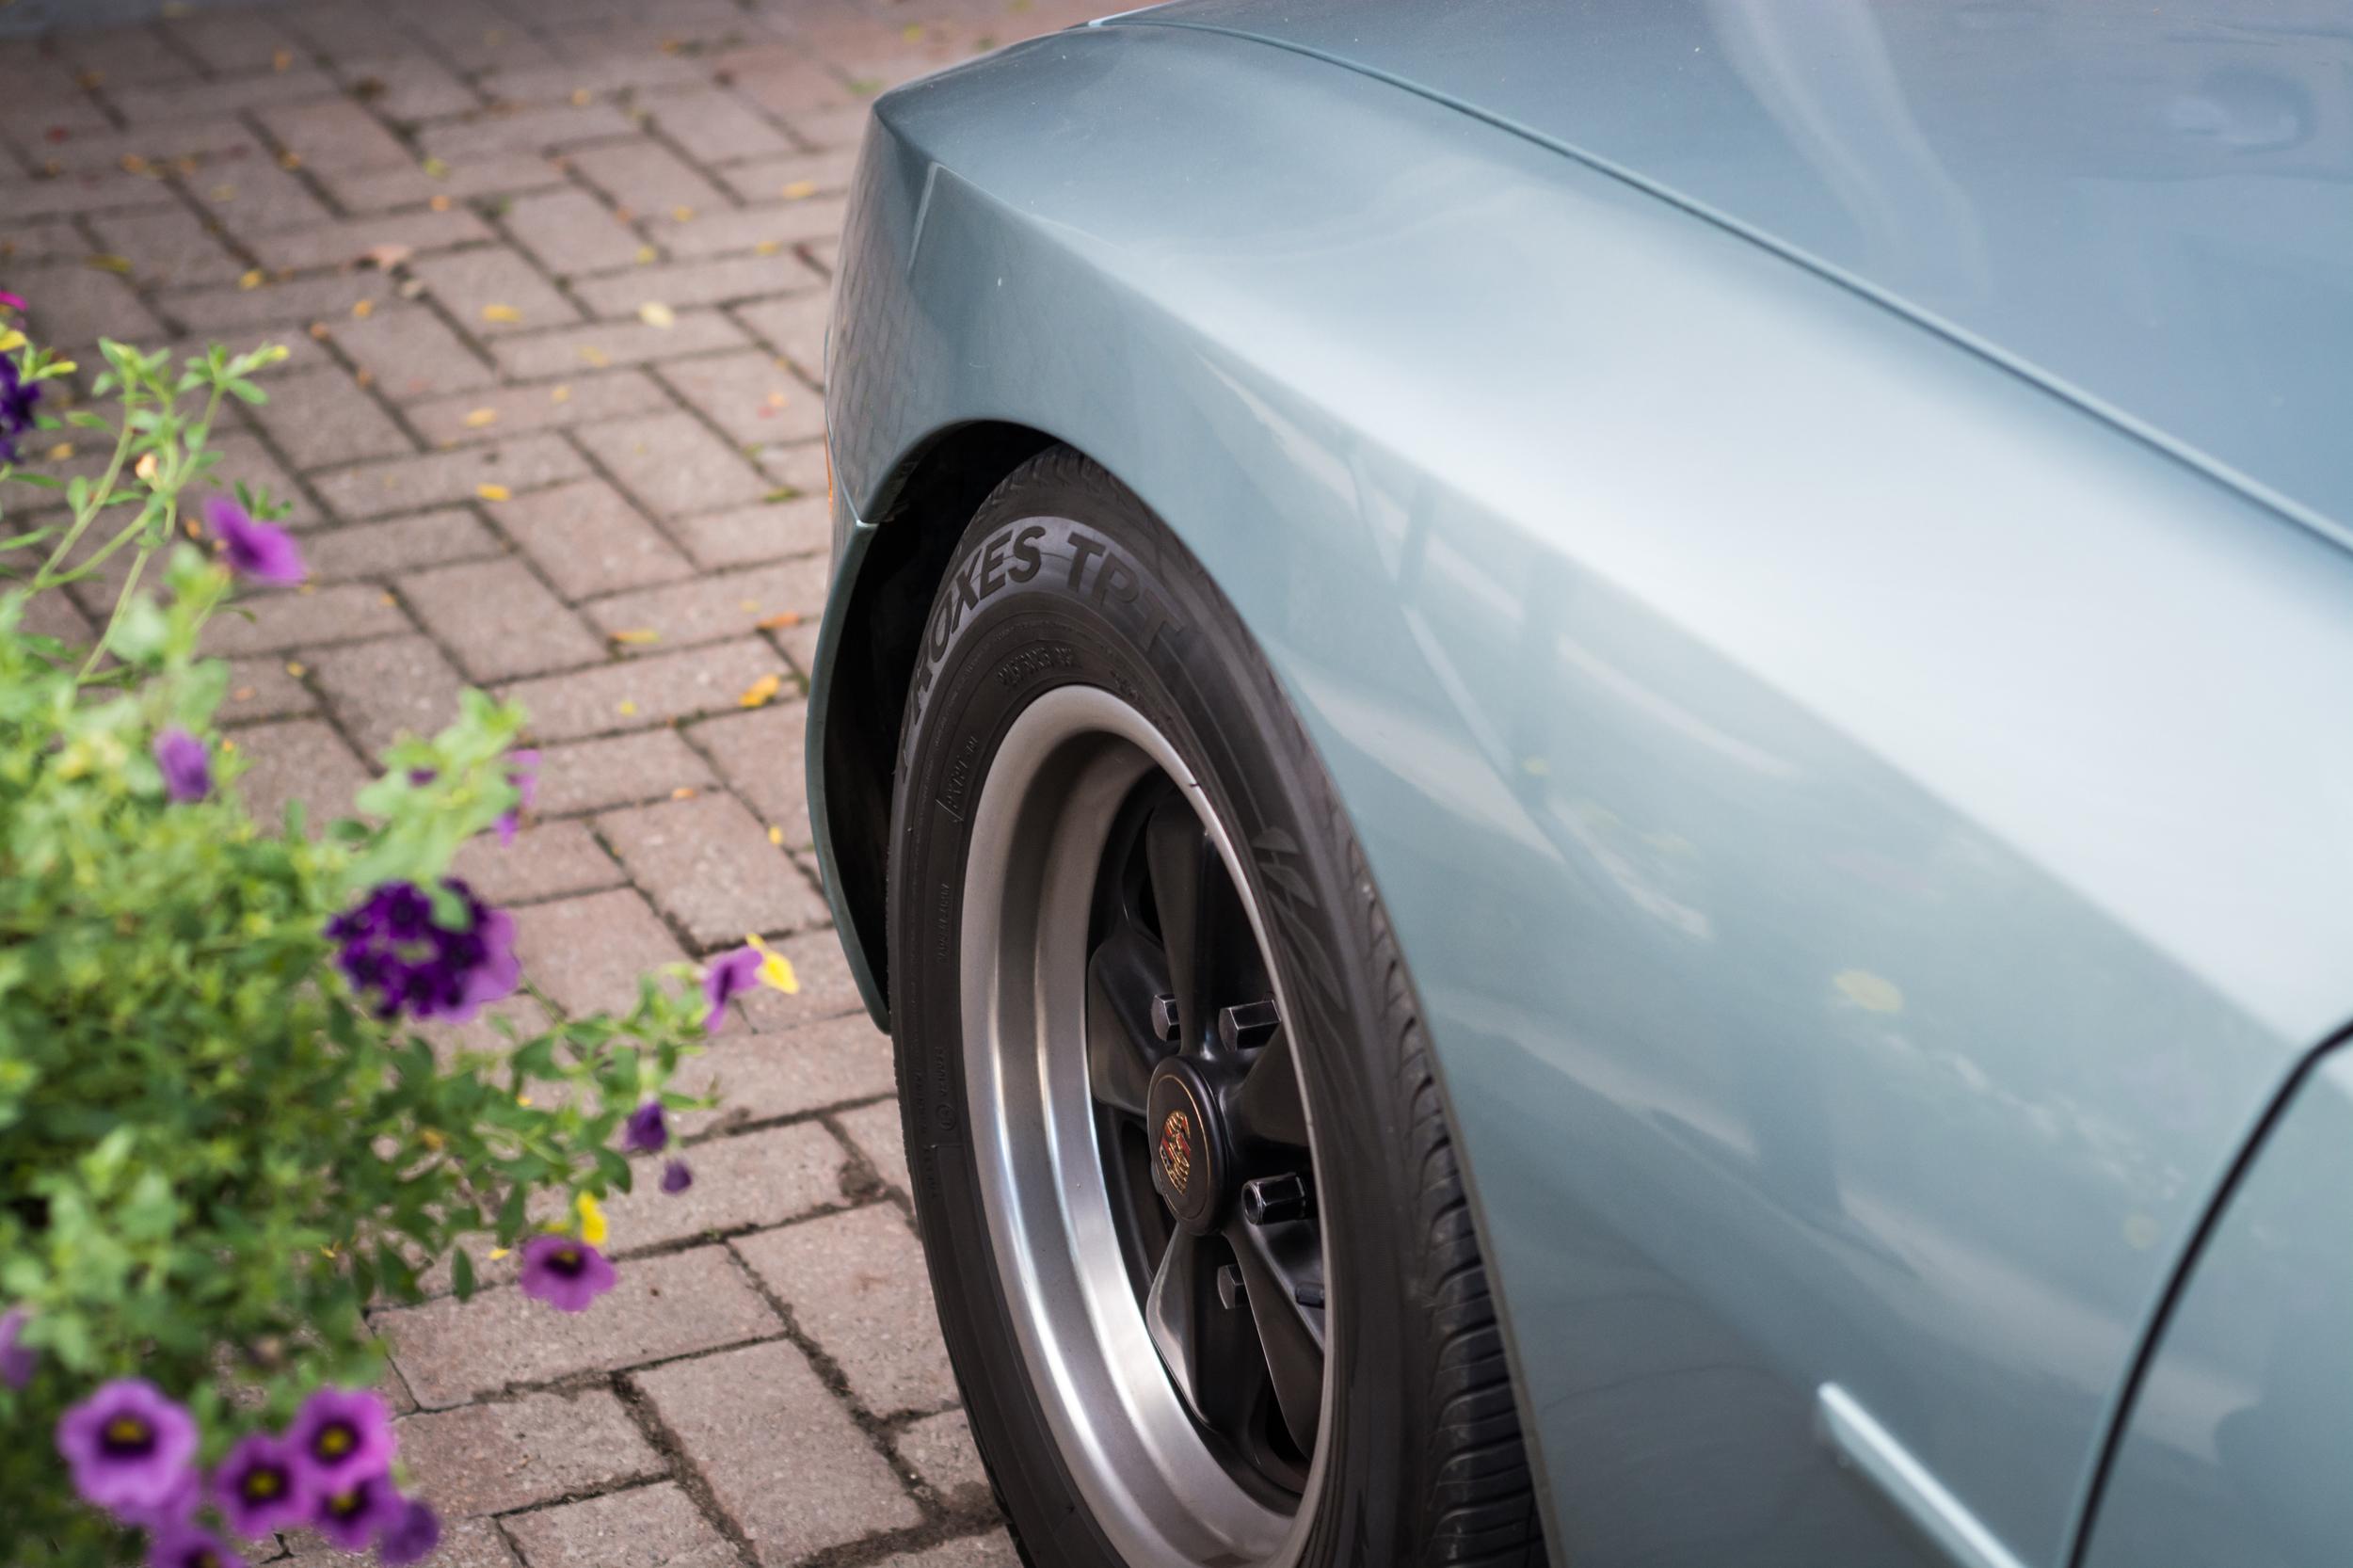 Beautifully polished Fuchs